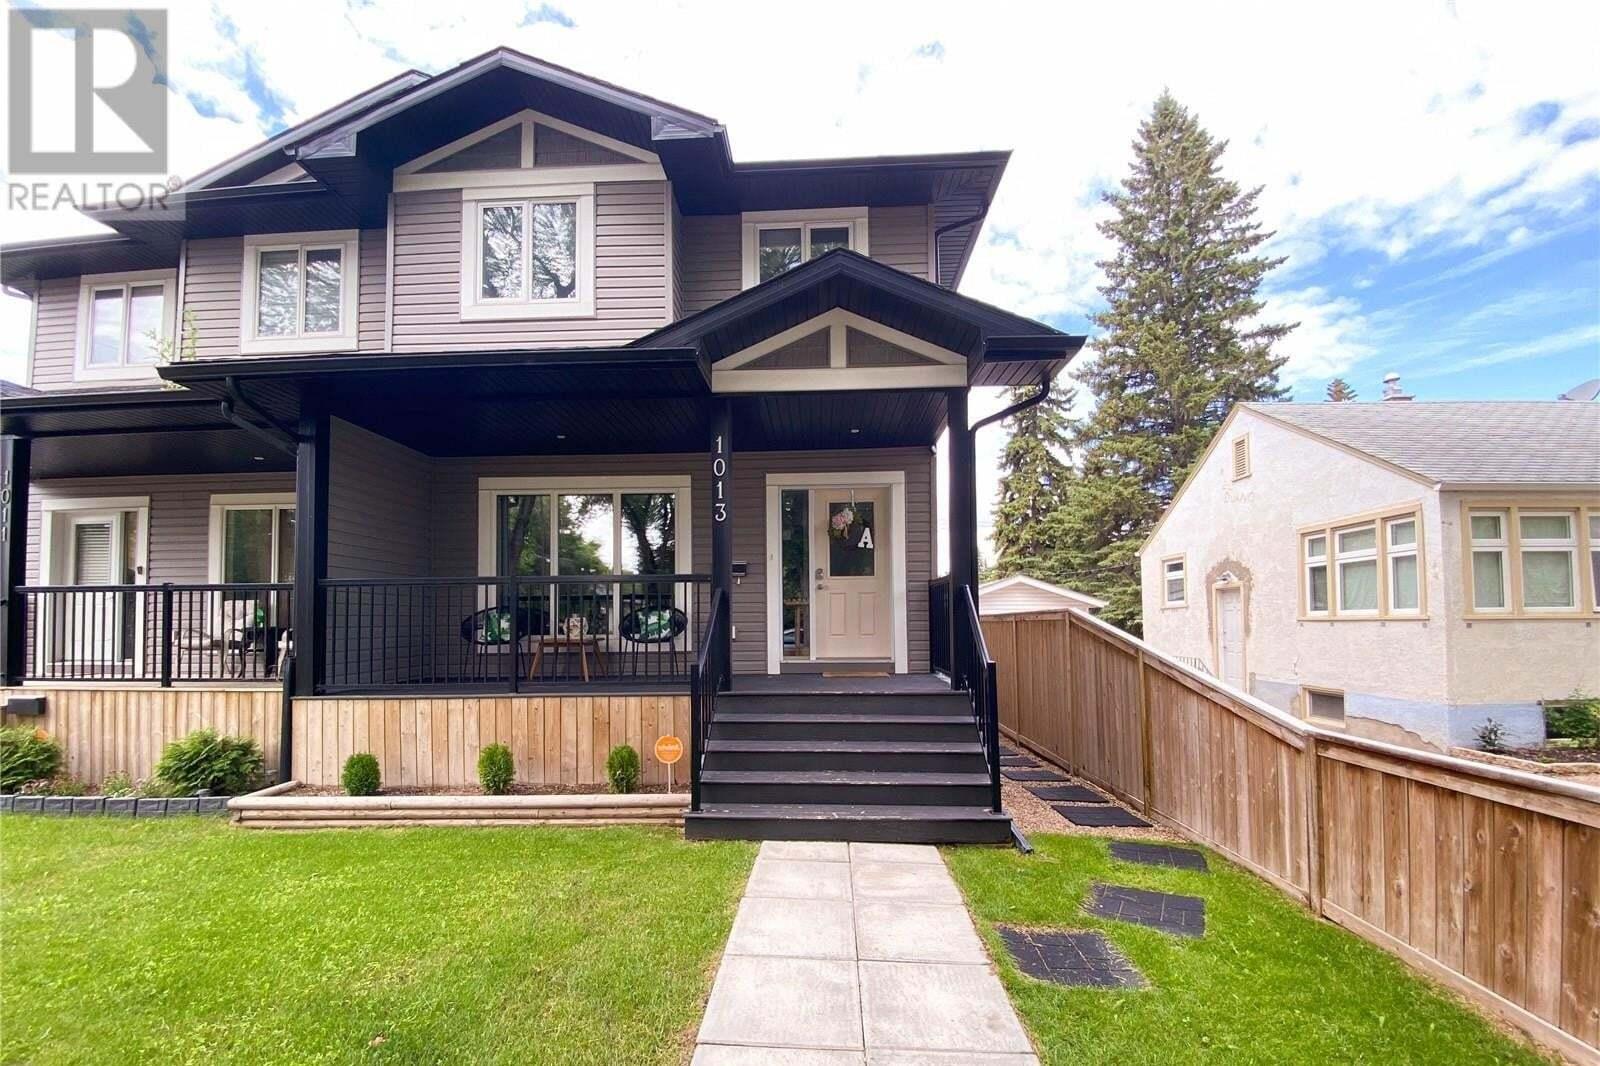 House for sale at 1013 H Ave N Saskatoon Saskatchewan - MLS: SK818059